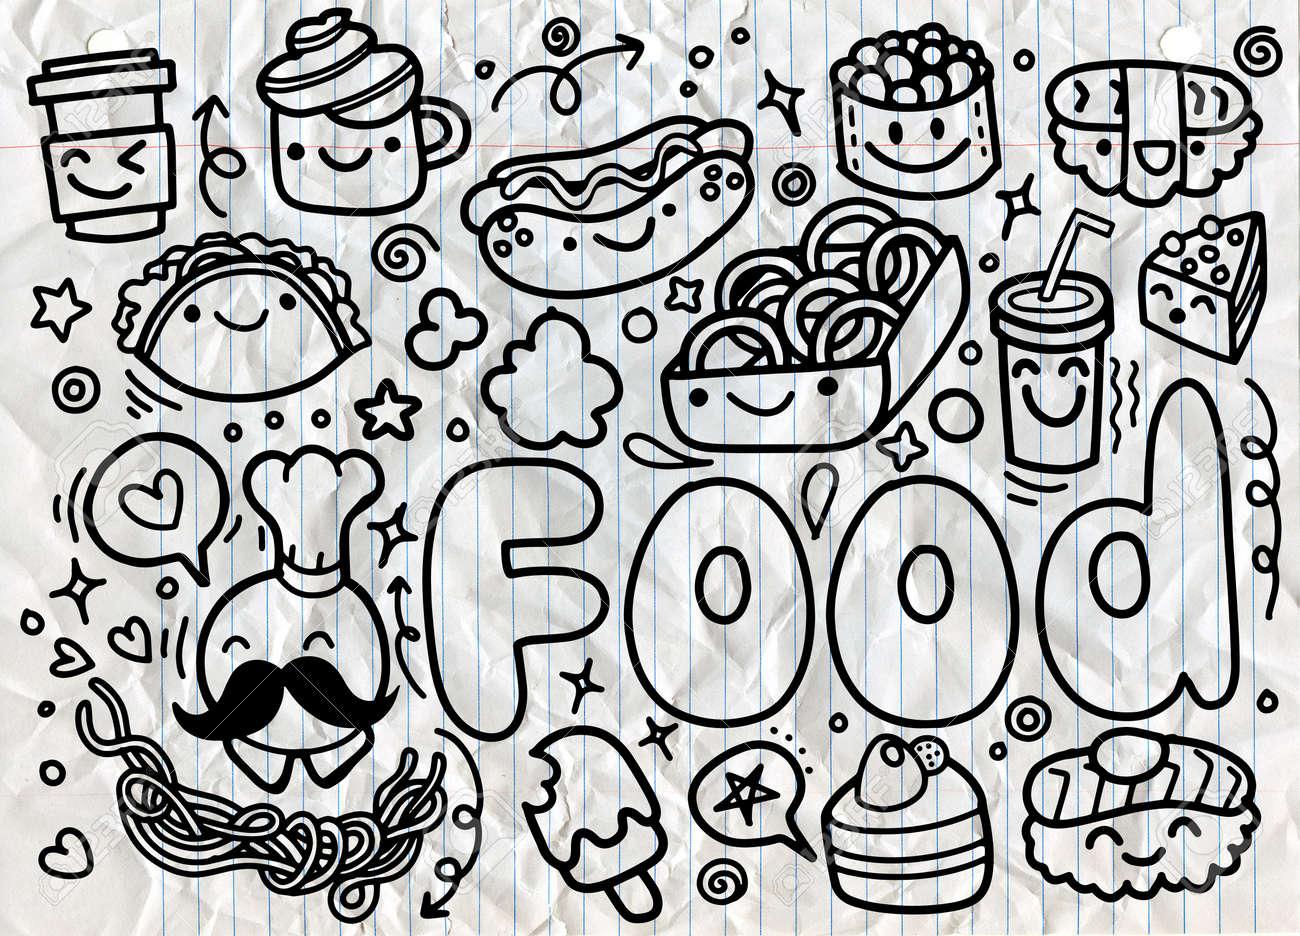 Hand Drawn Food Doodles Vector Royalty Free Cliparts Vectors And